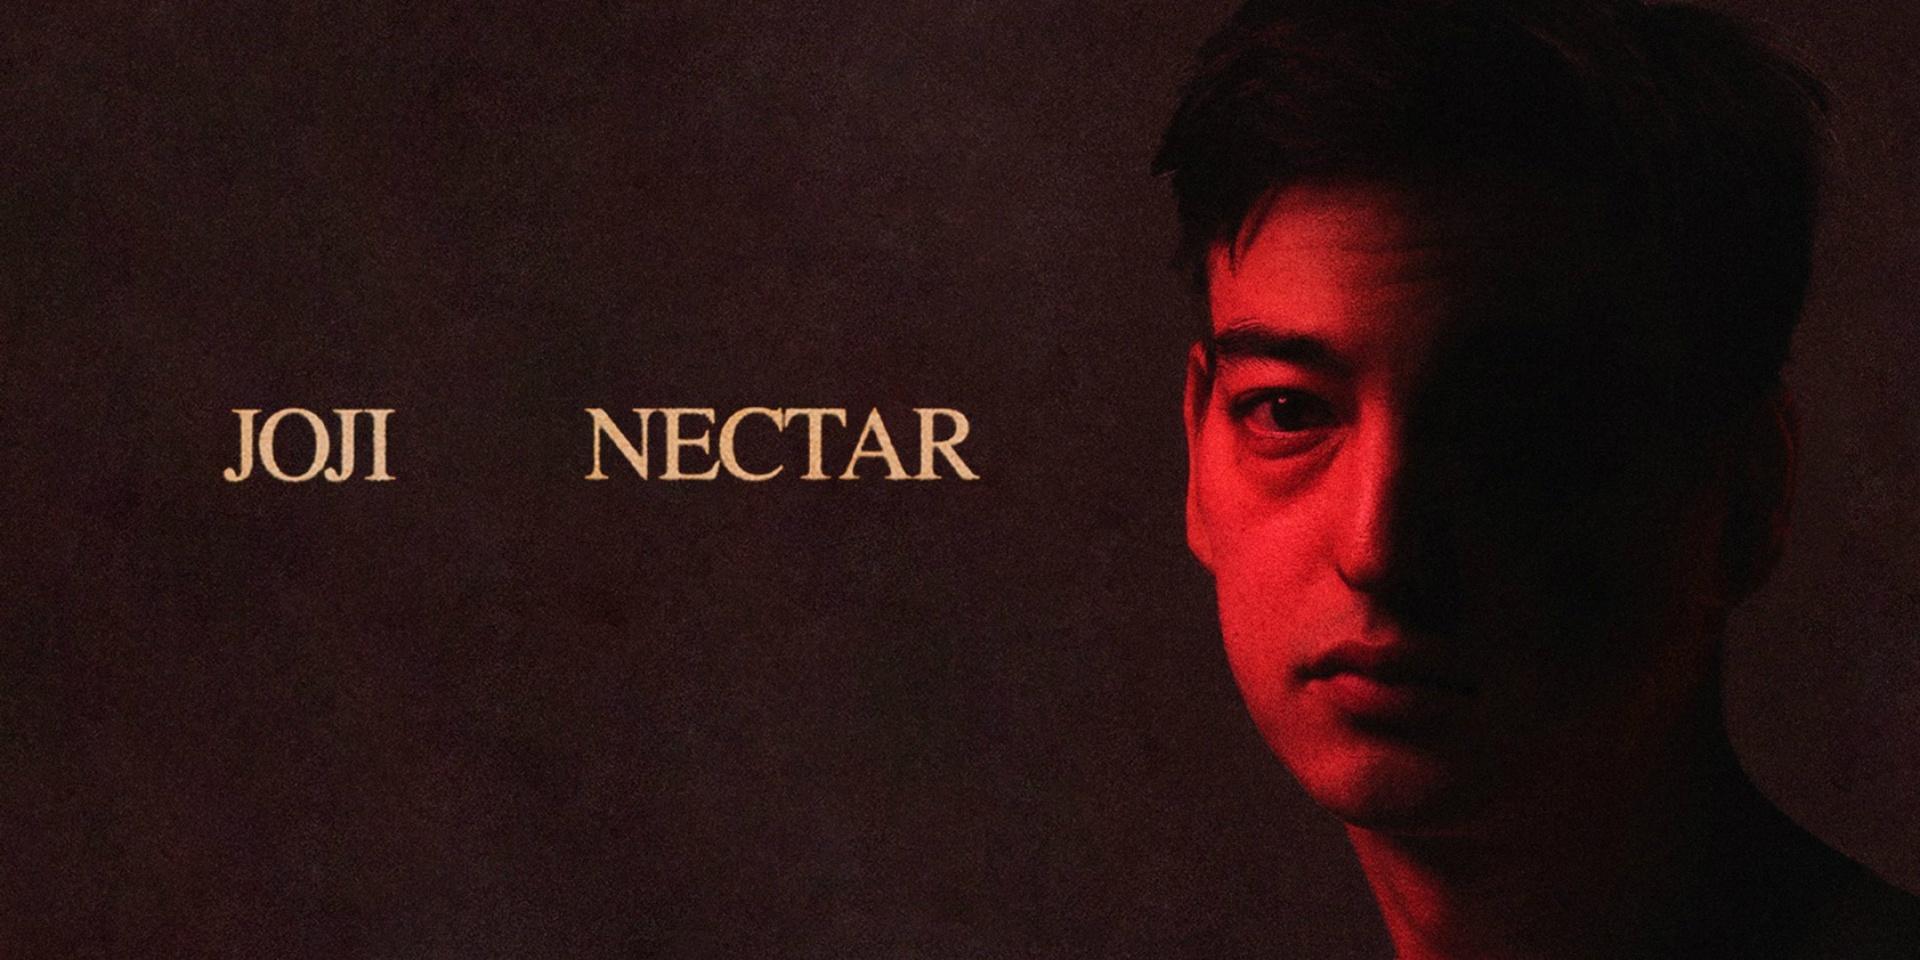 Joji's sophomore album NECTAR is finally here – listen